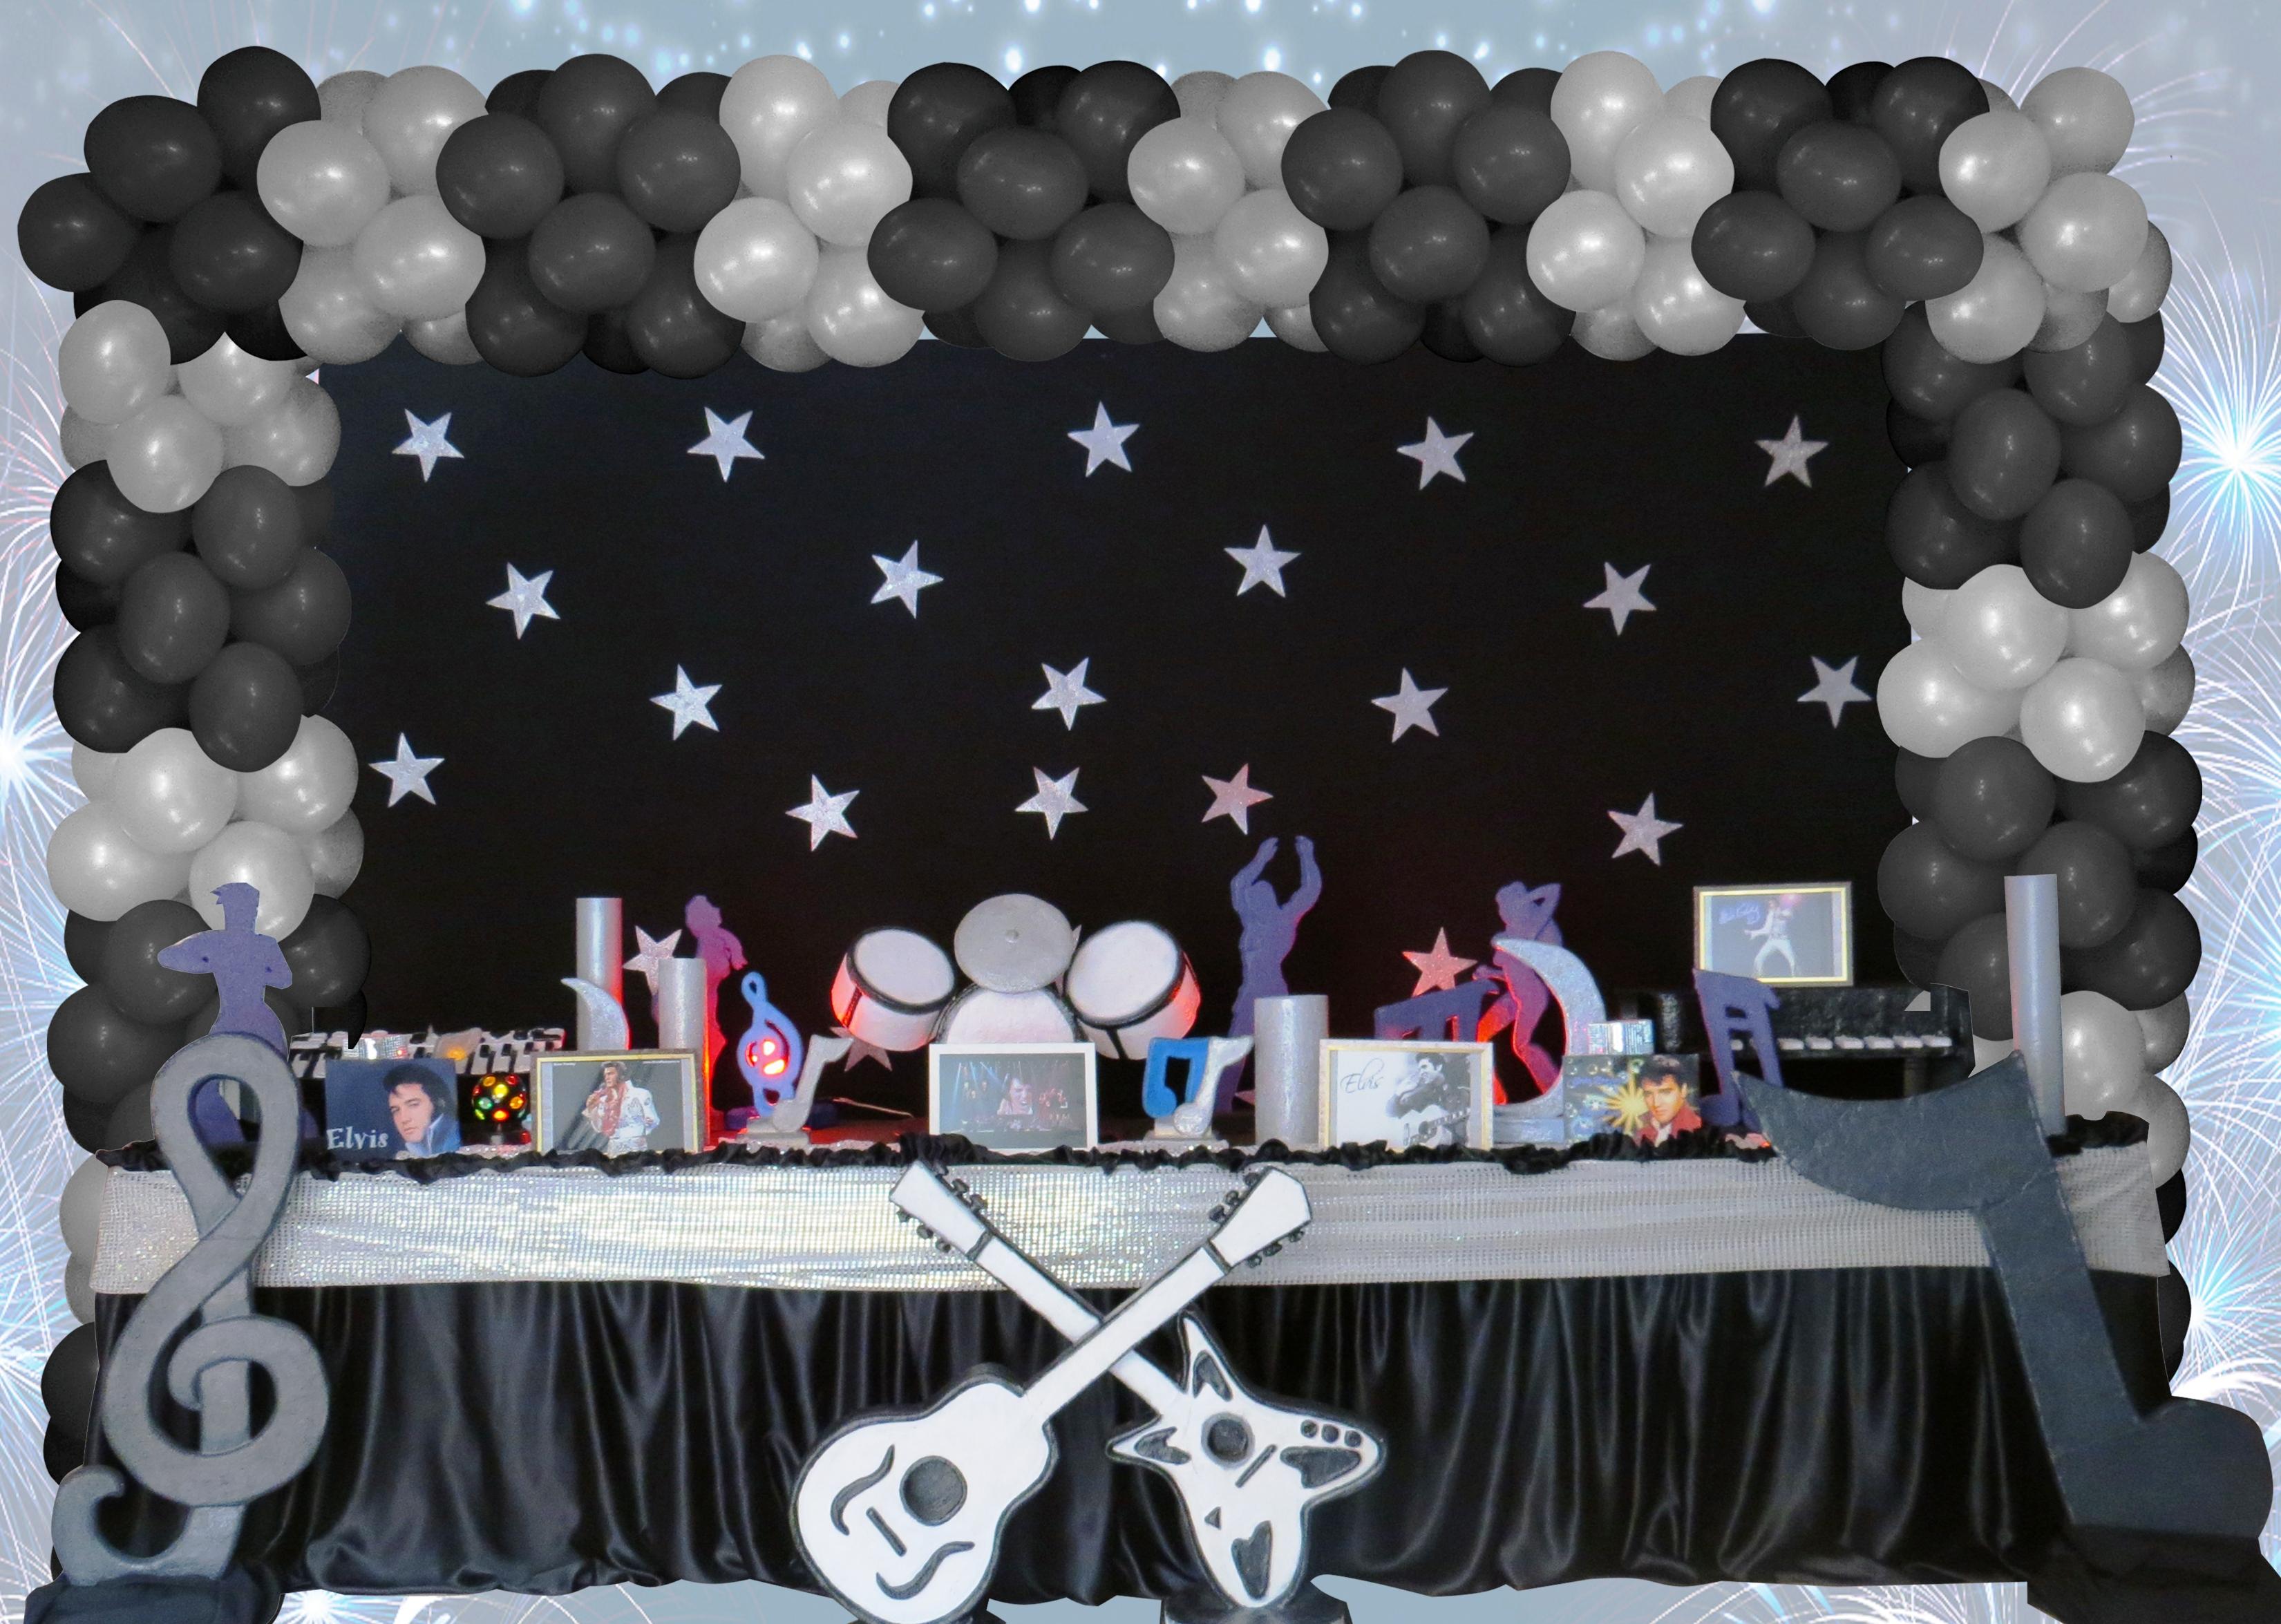 decoracao festa balada infantil:decoracao-infantil-anos-0-elvis-praise